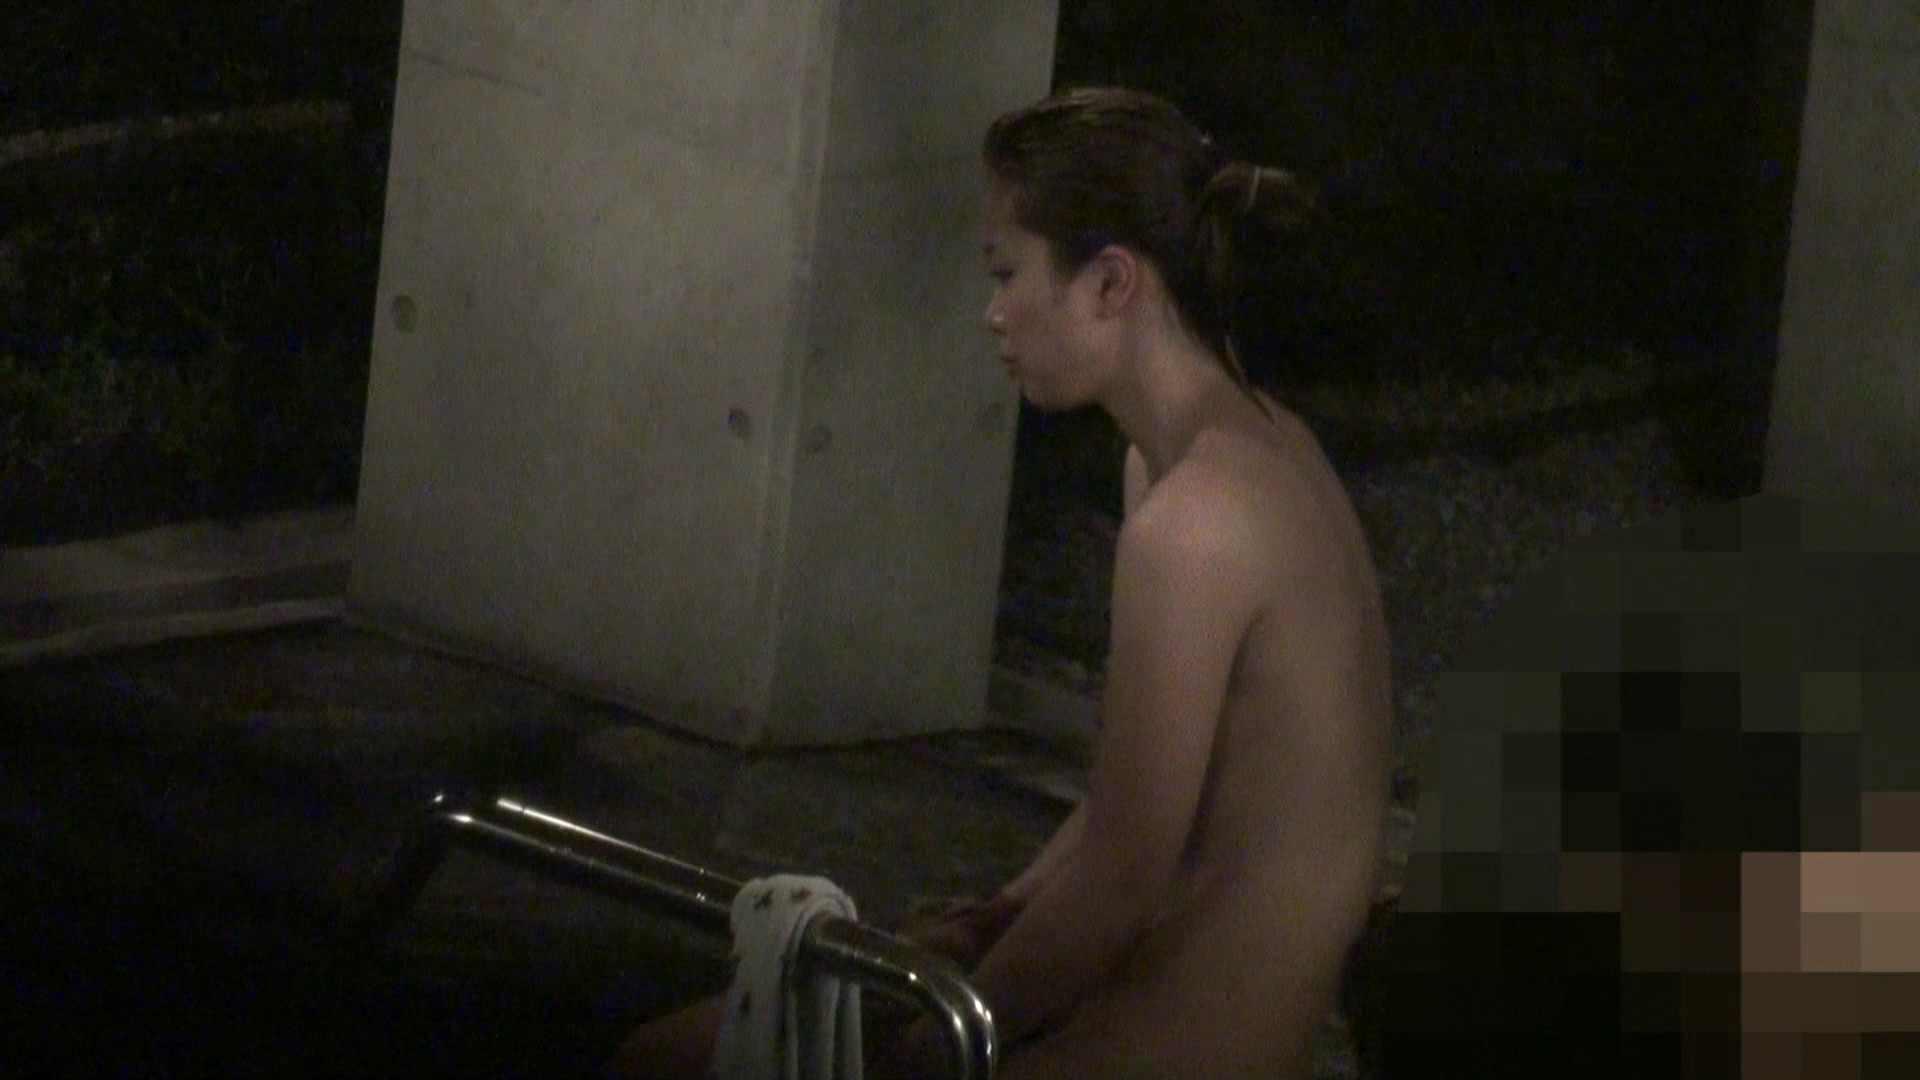 Aquaな露天風呂Vol.351 綺麗なOLたち 戯れ無修正画像 89枚 83